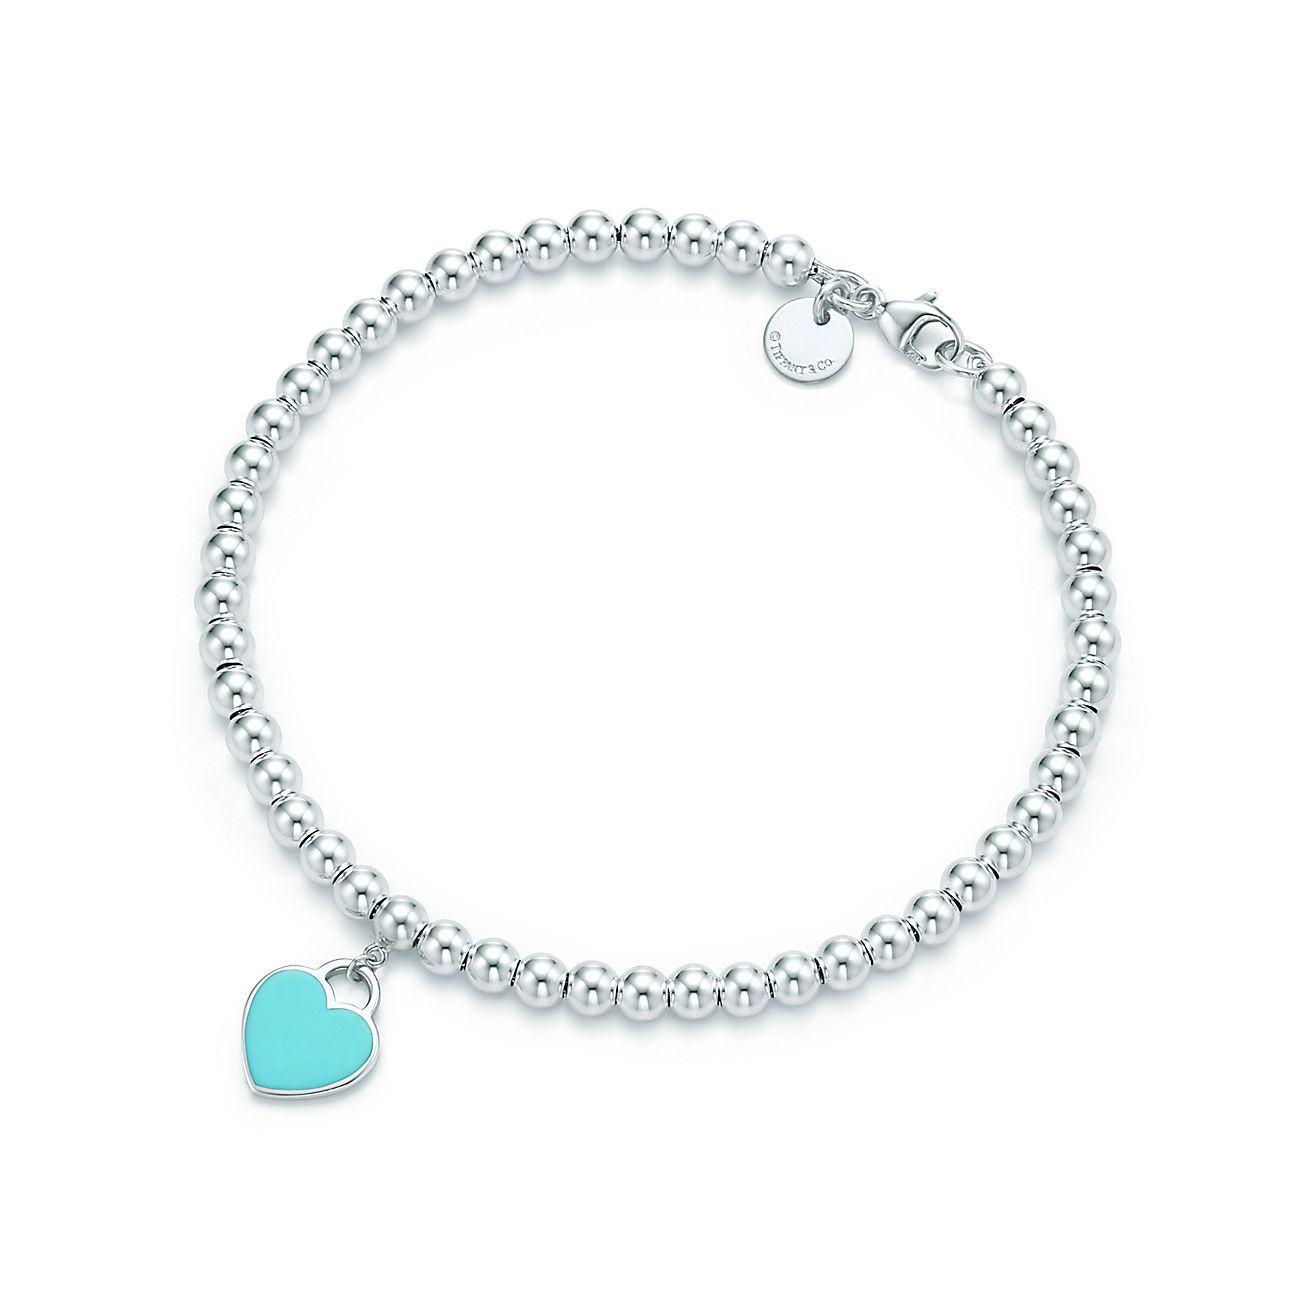 Jewelry Bracelets Return To Tiffany Bead Bracelet Grp03577 Top Tiffany Bracelets